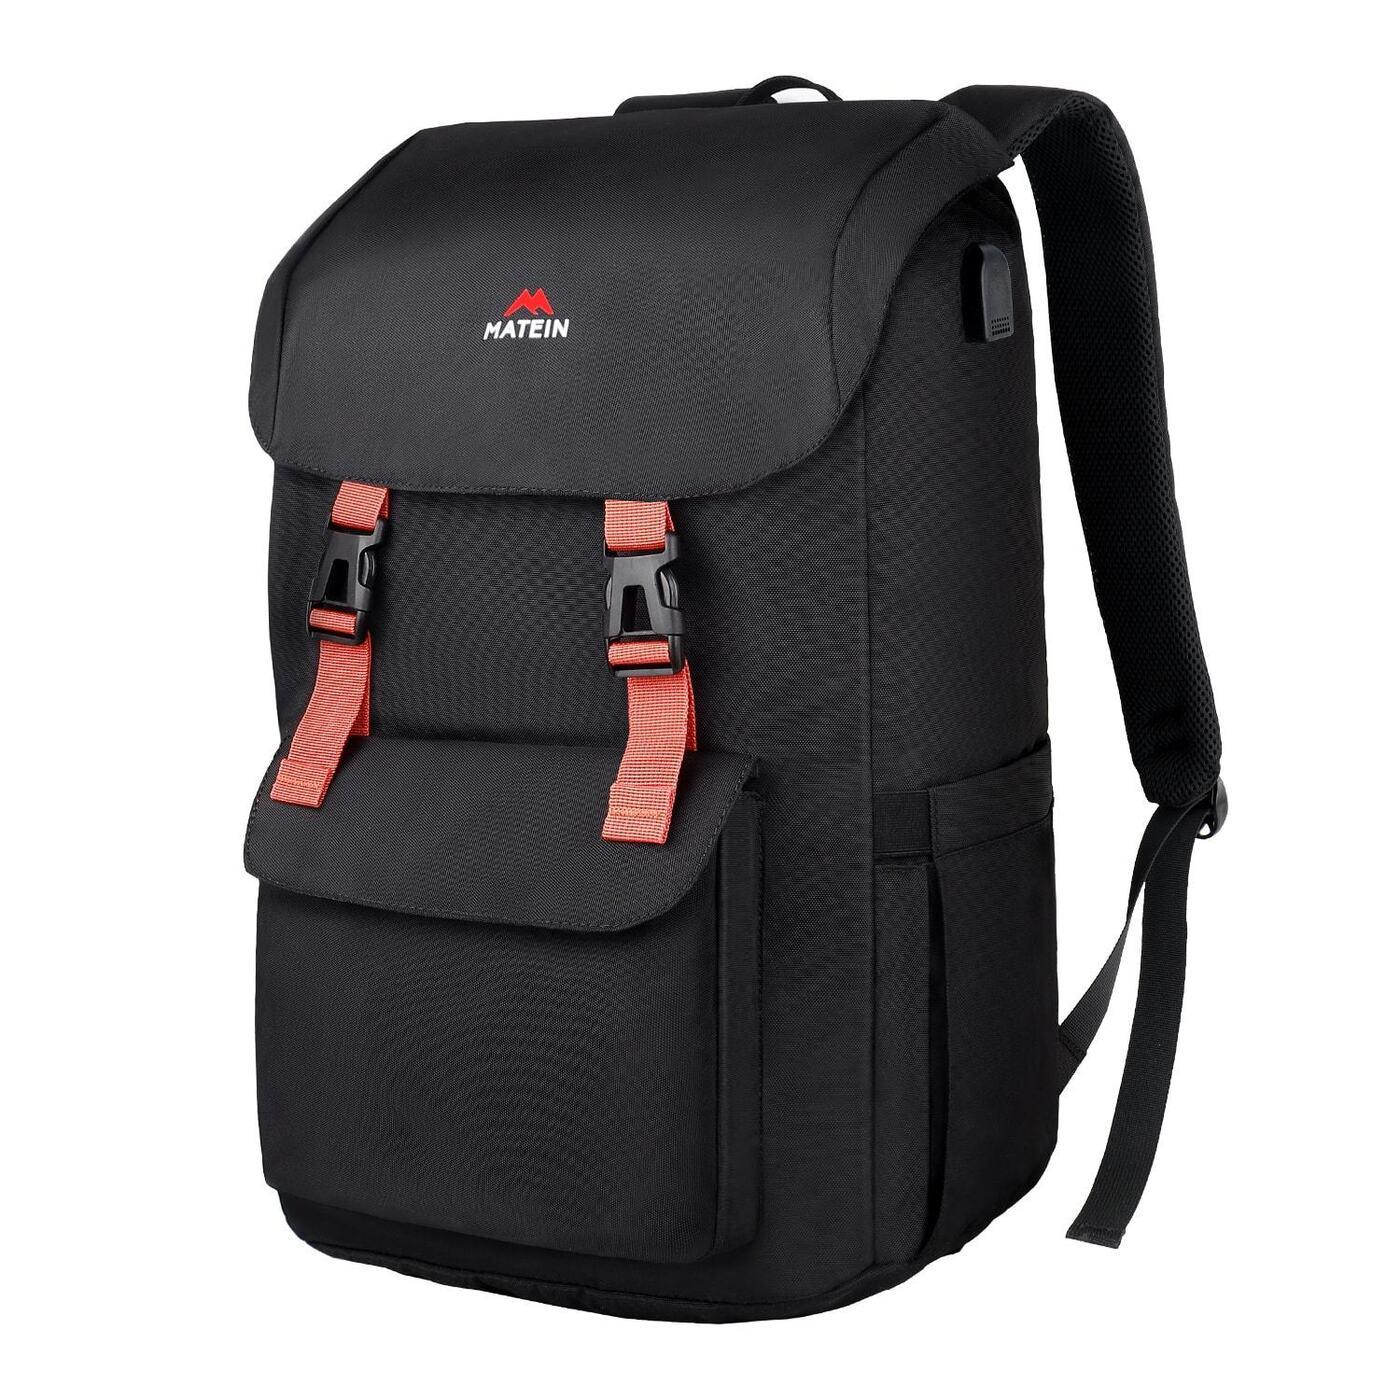 "Рюкзак для ноутбука Matein Super backpack, 17"", черный"